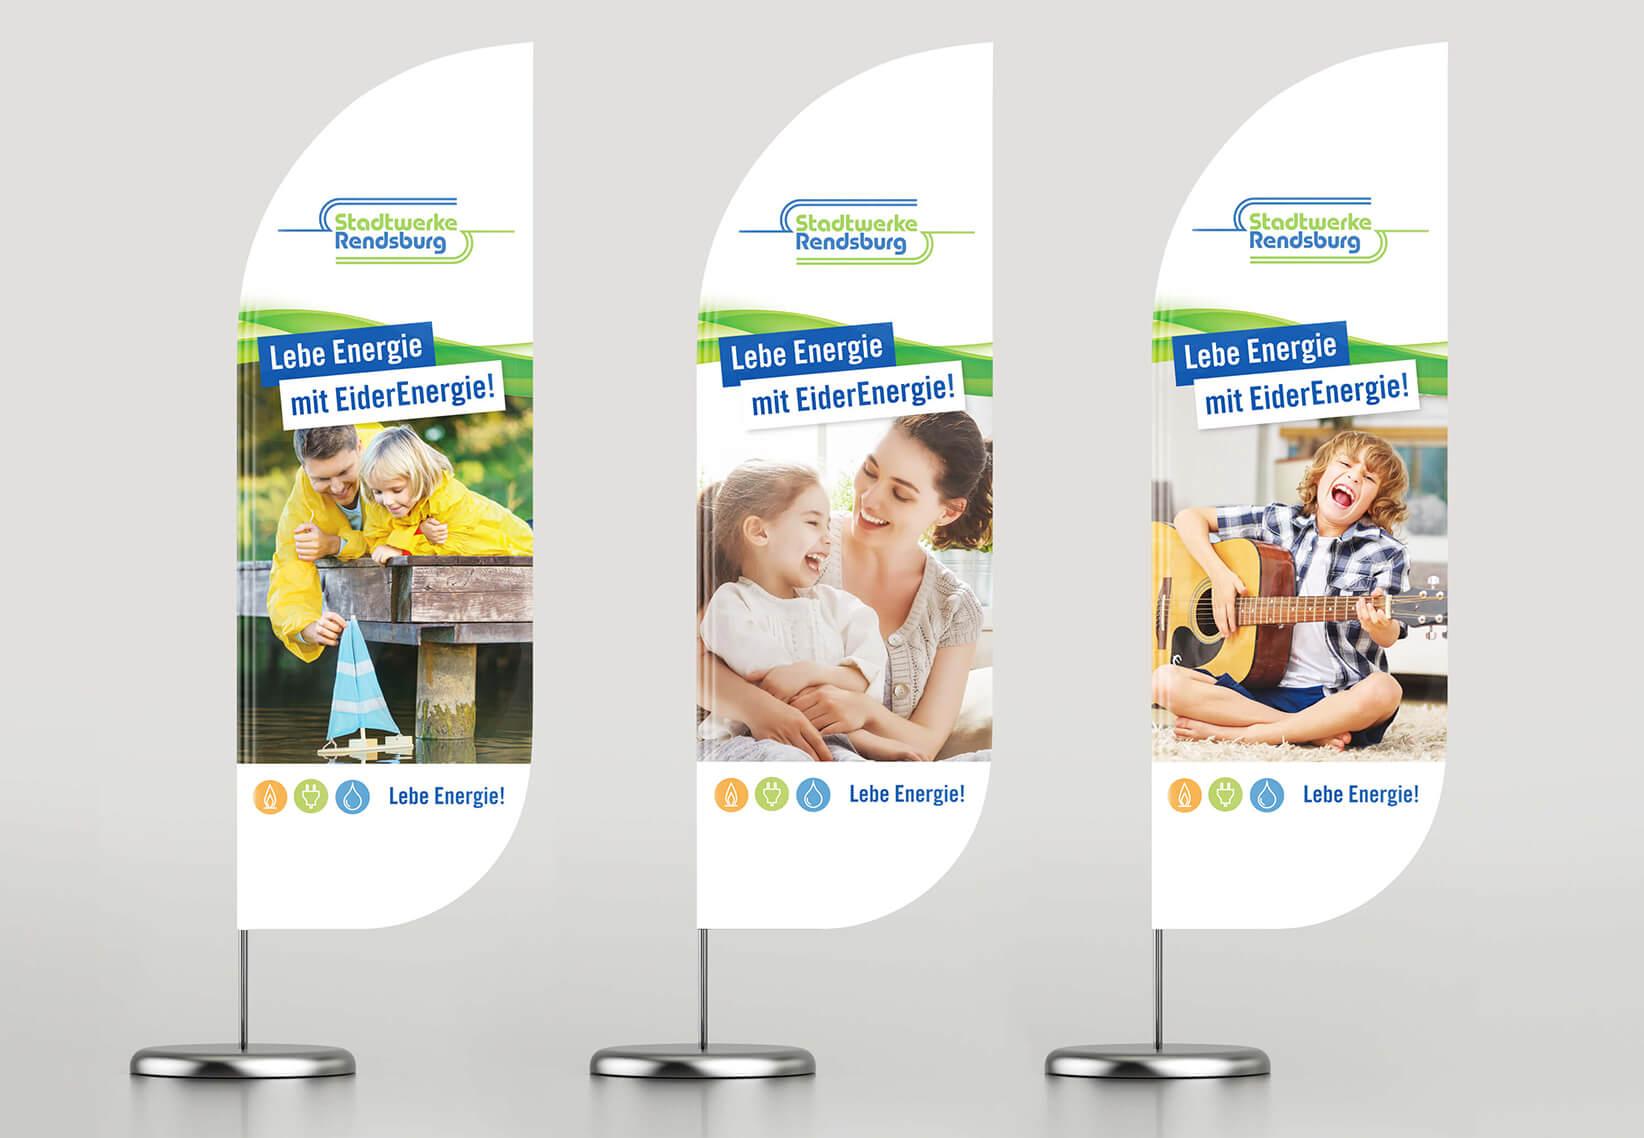 Marketing_stadtwerke_rendsburg_2